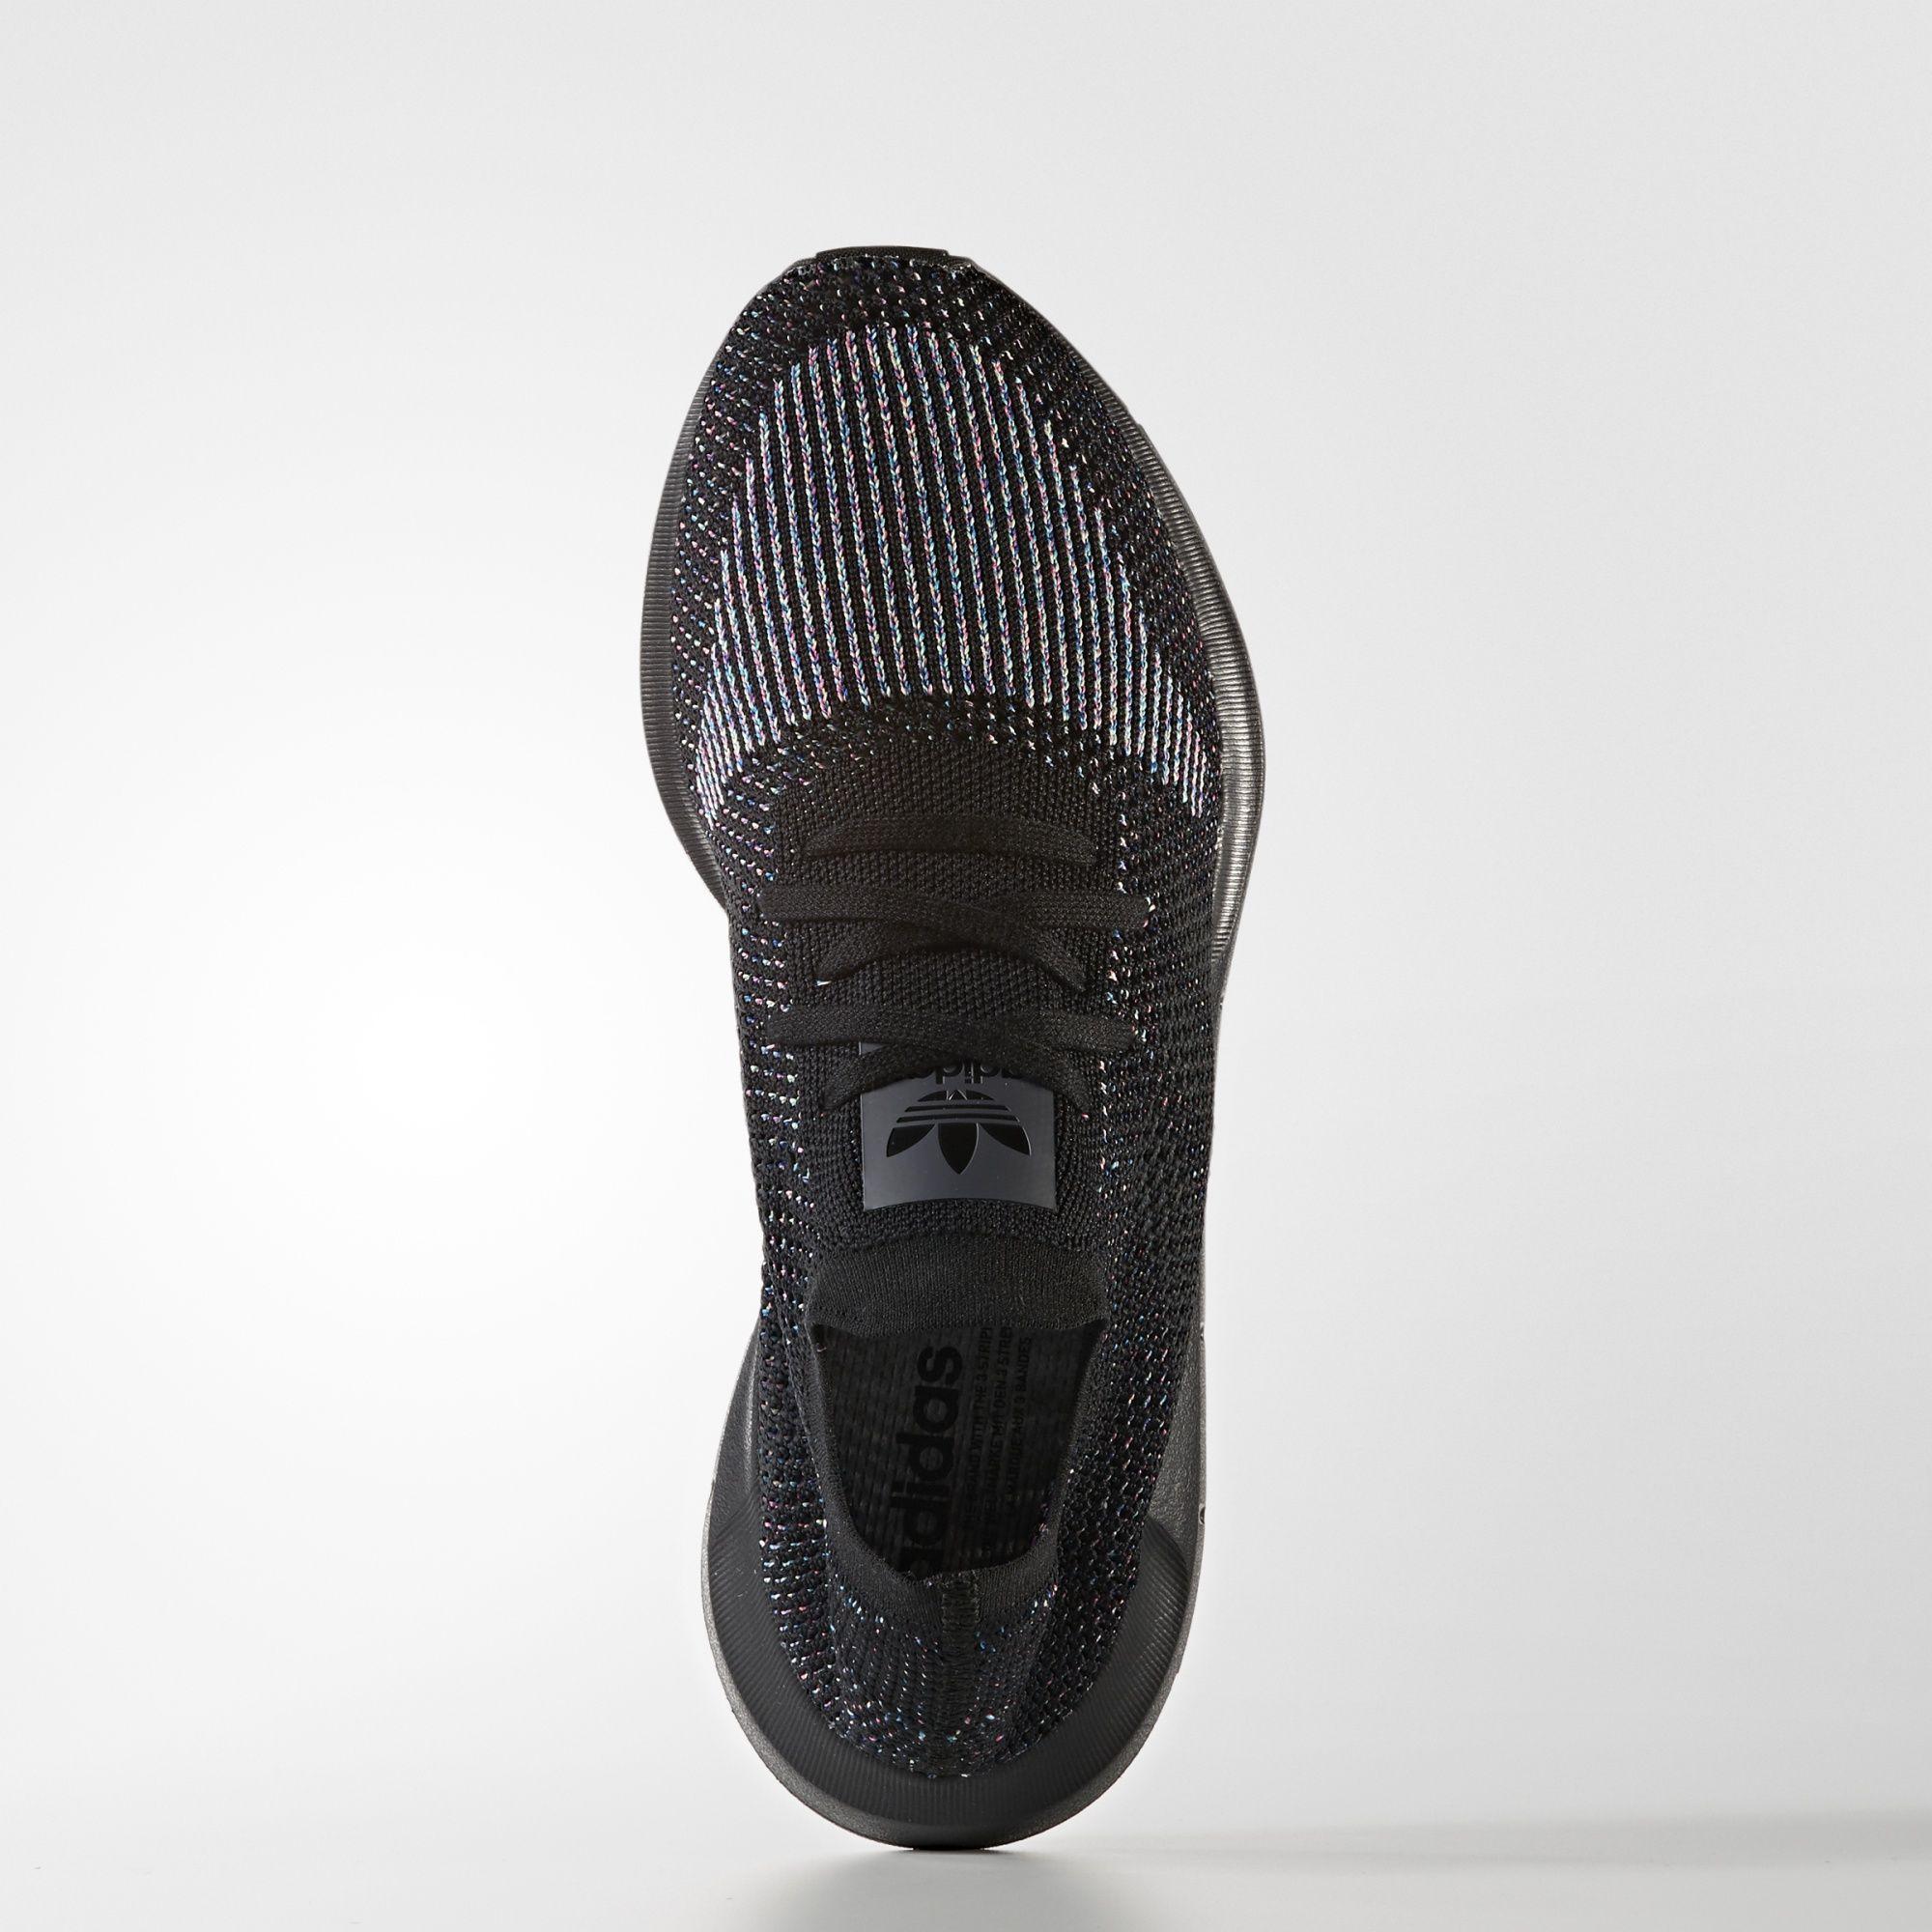 CG4127 adidas Swift Run Primeknit Black 1